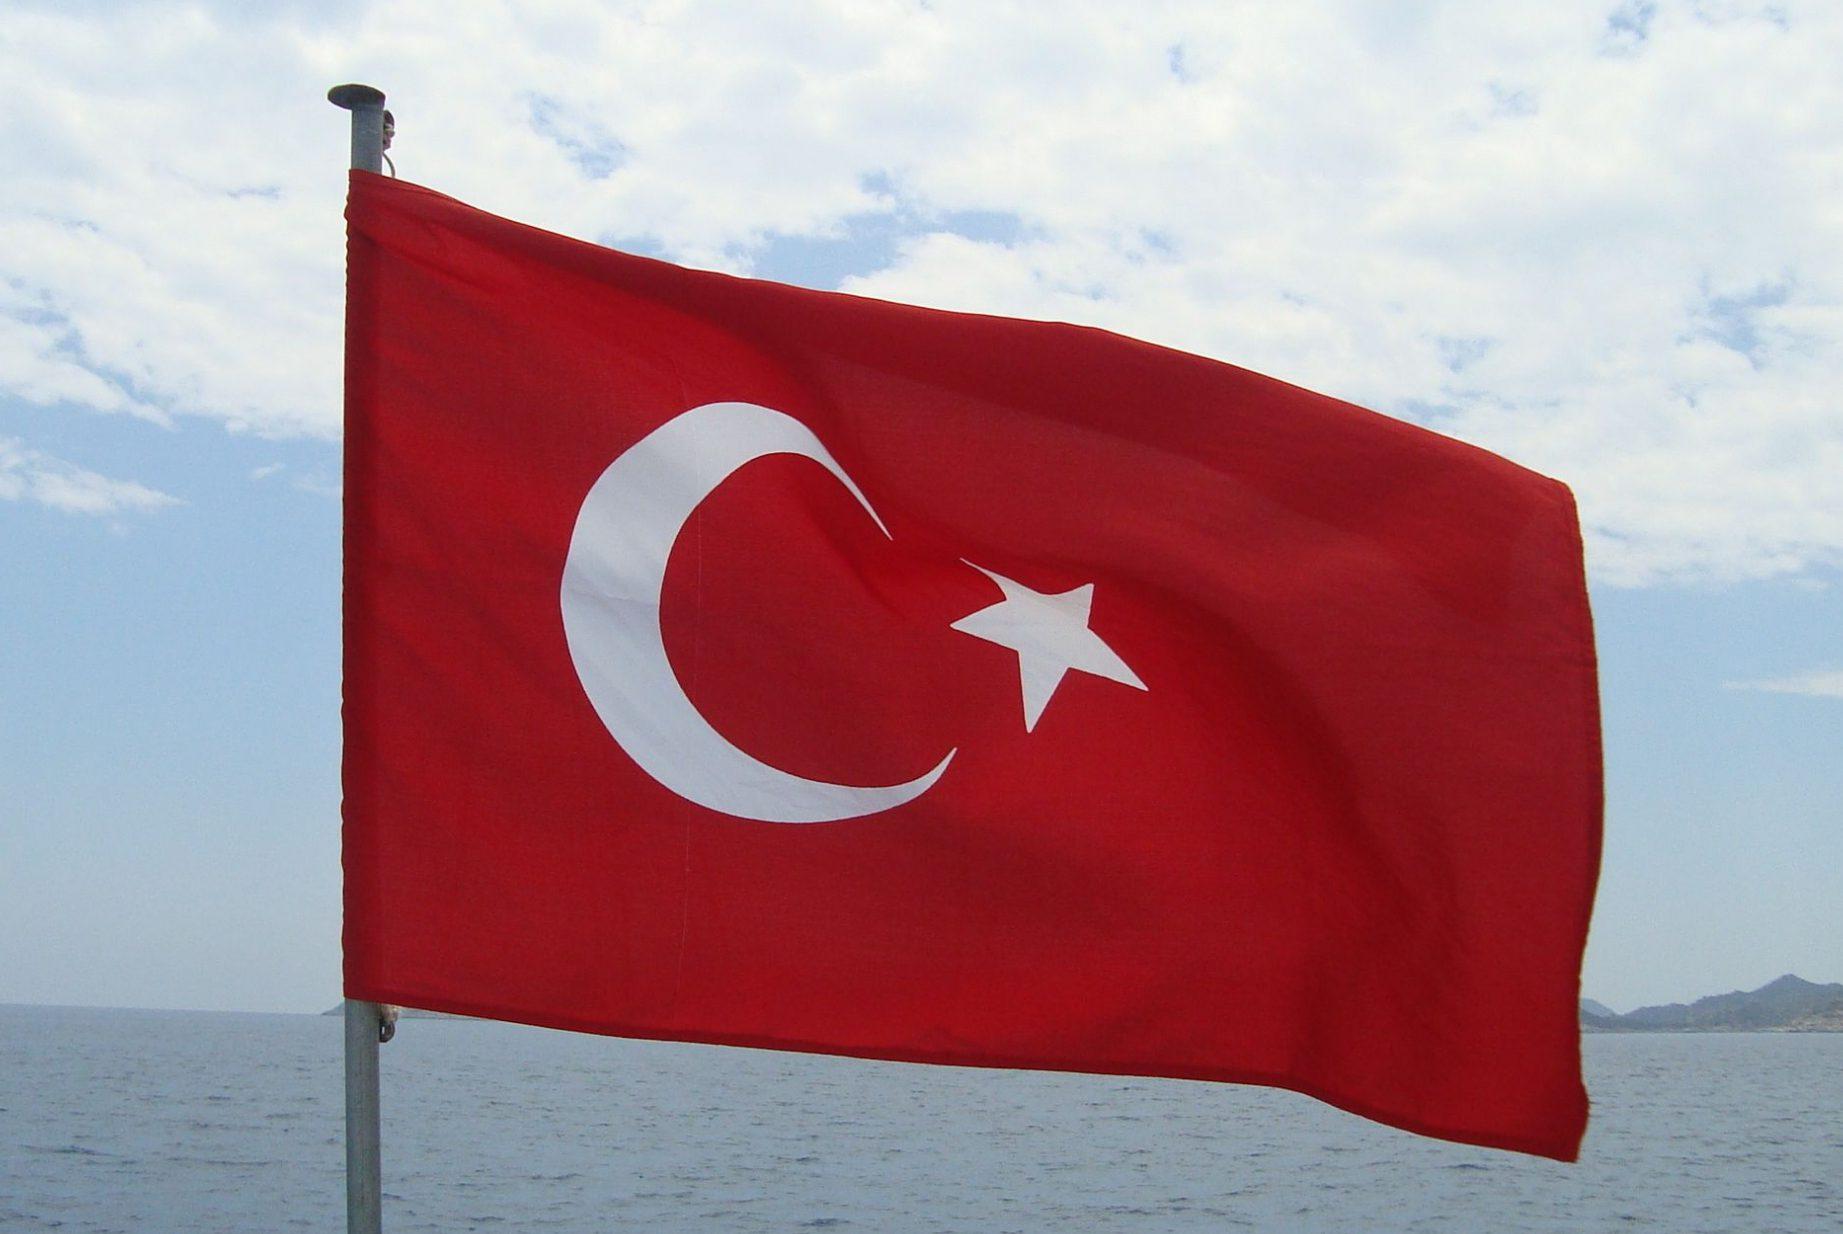 Картинка с турецким флагом